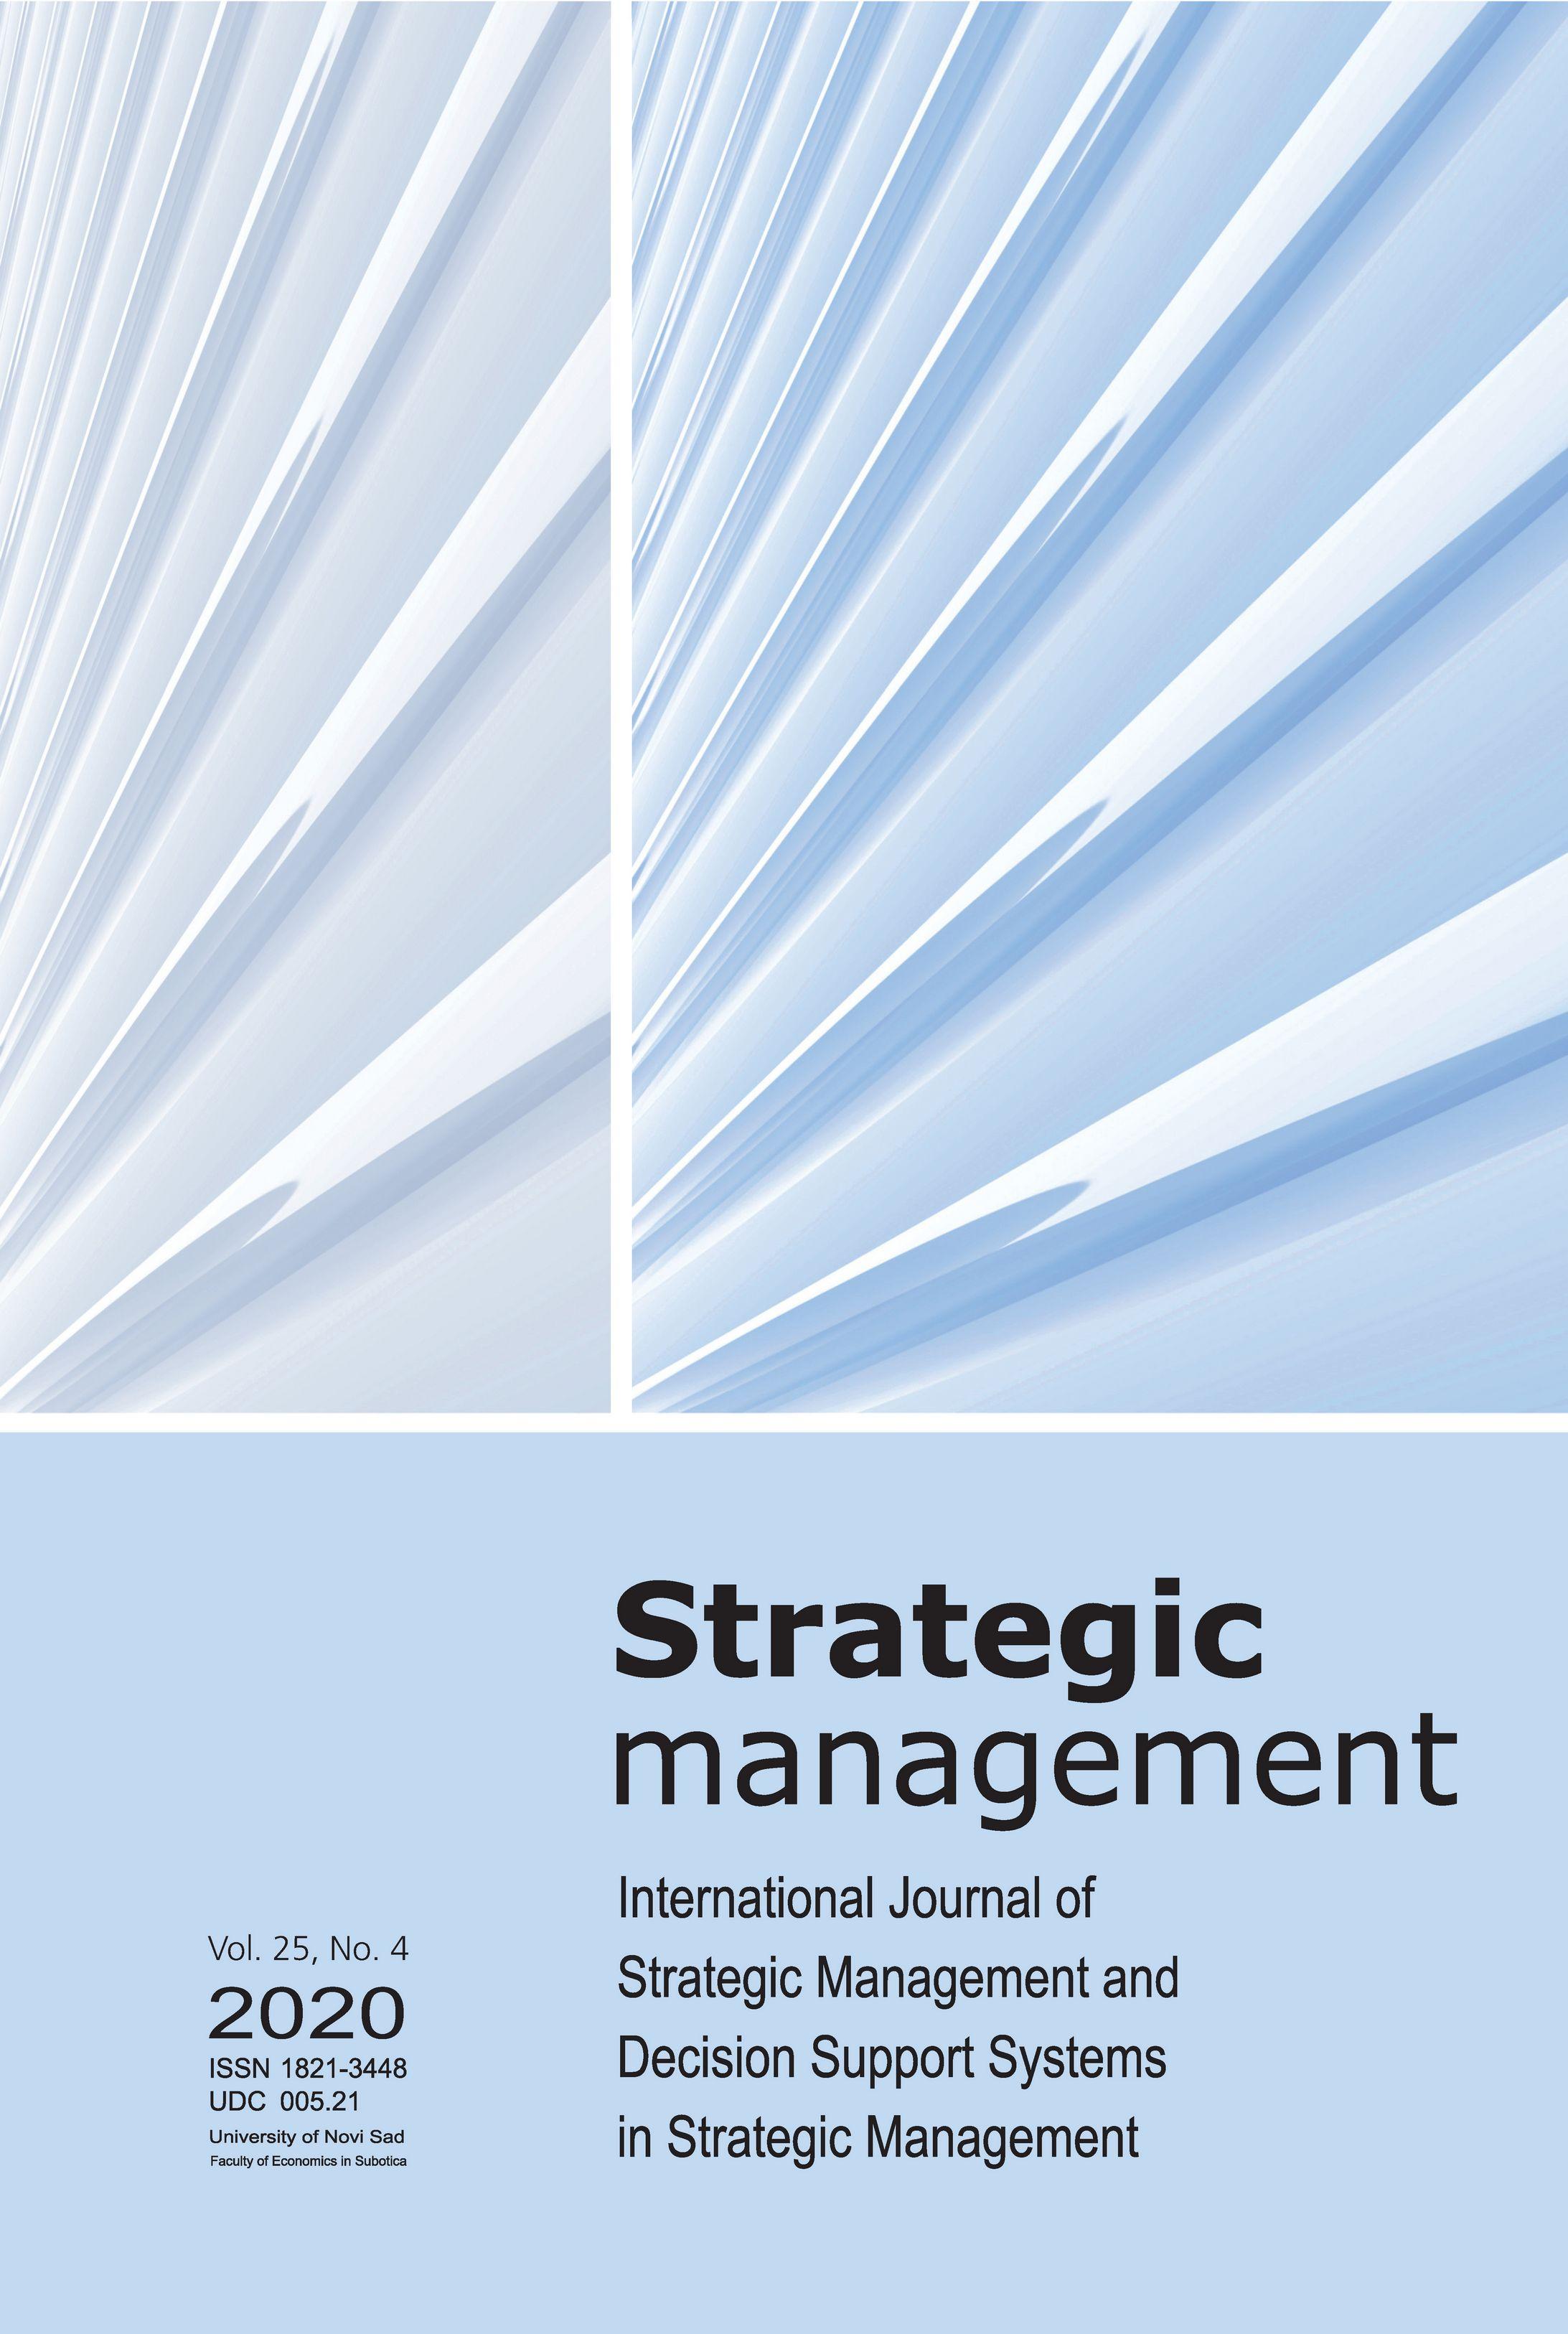 View Vol. 25 No. 4 (2020): Strategic Management